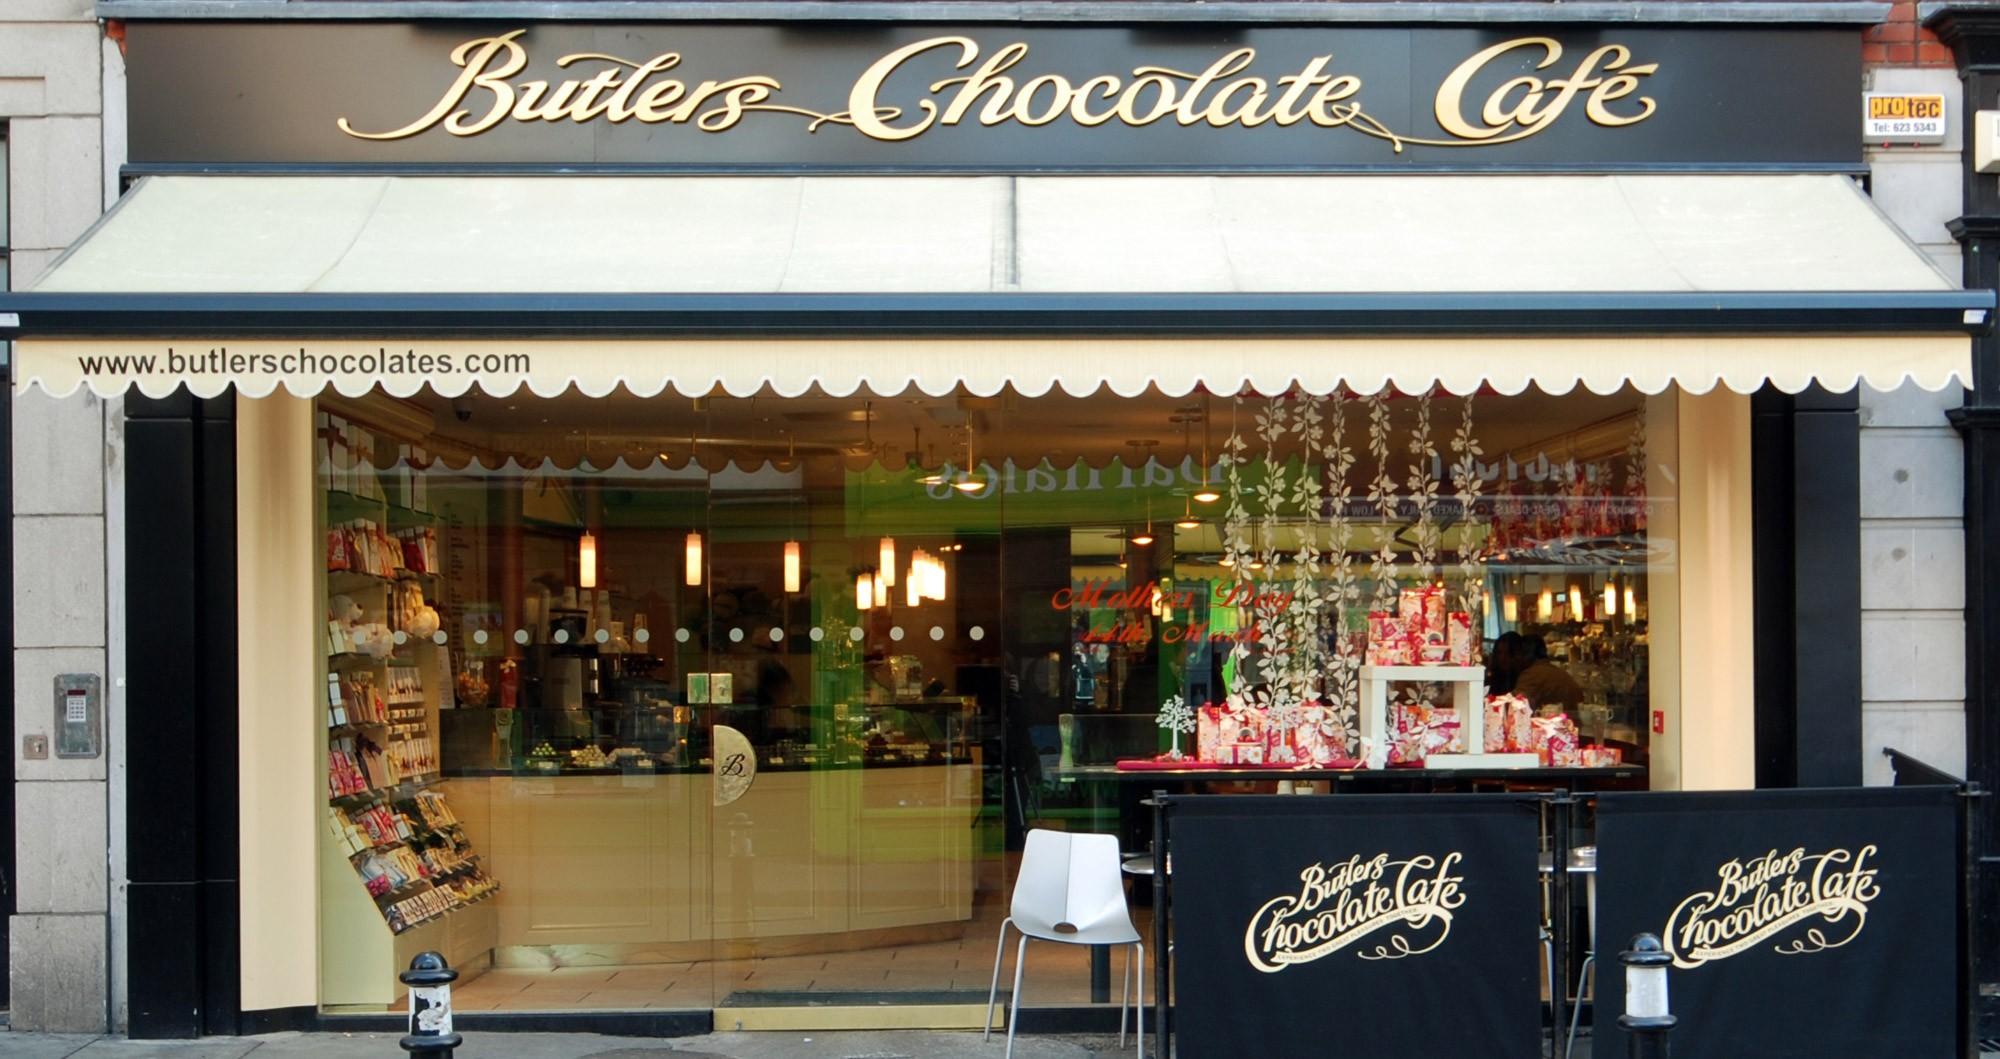 Butlers Chocolate Café, Liffey Street